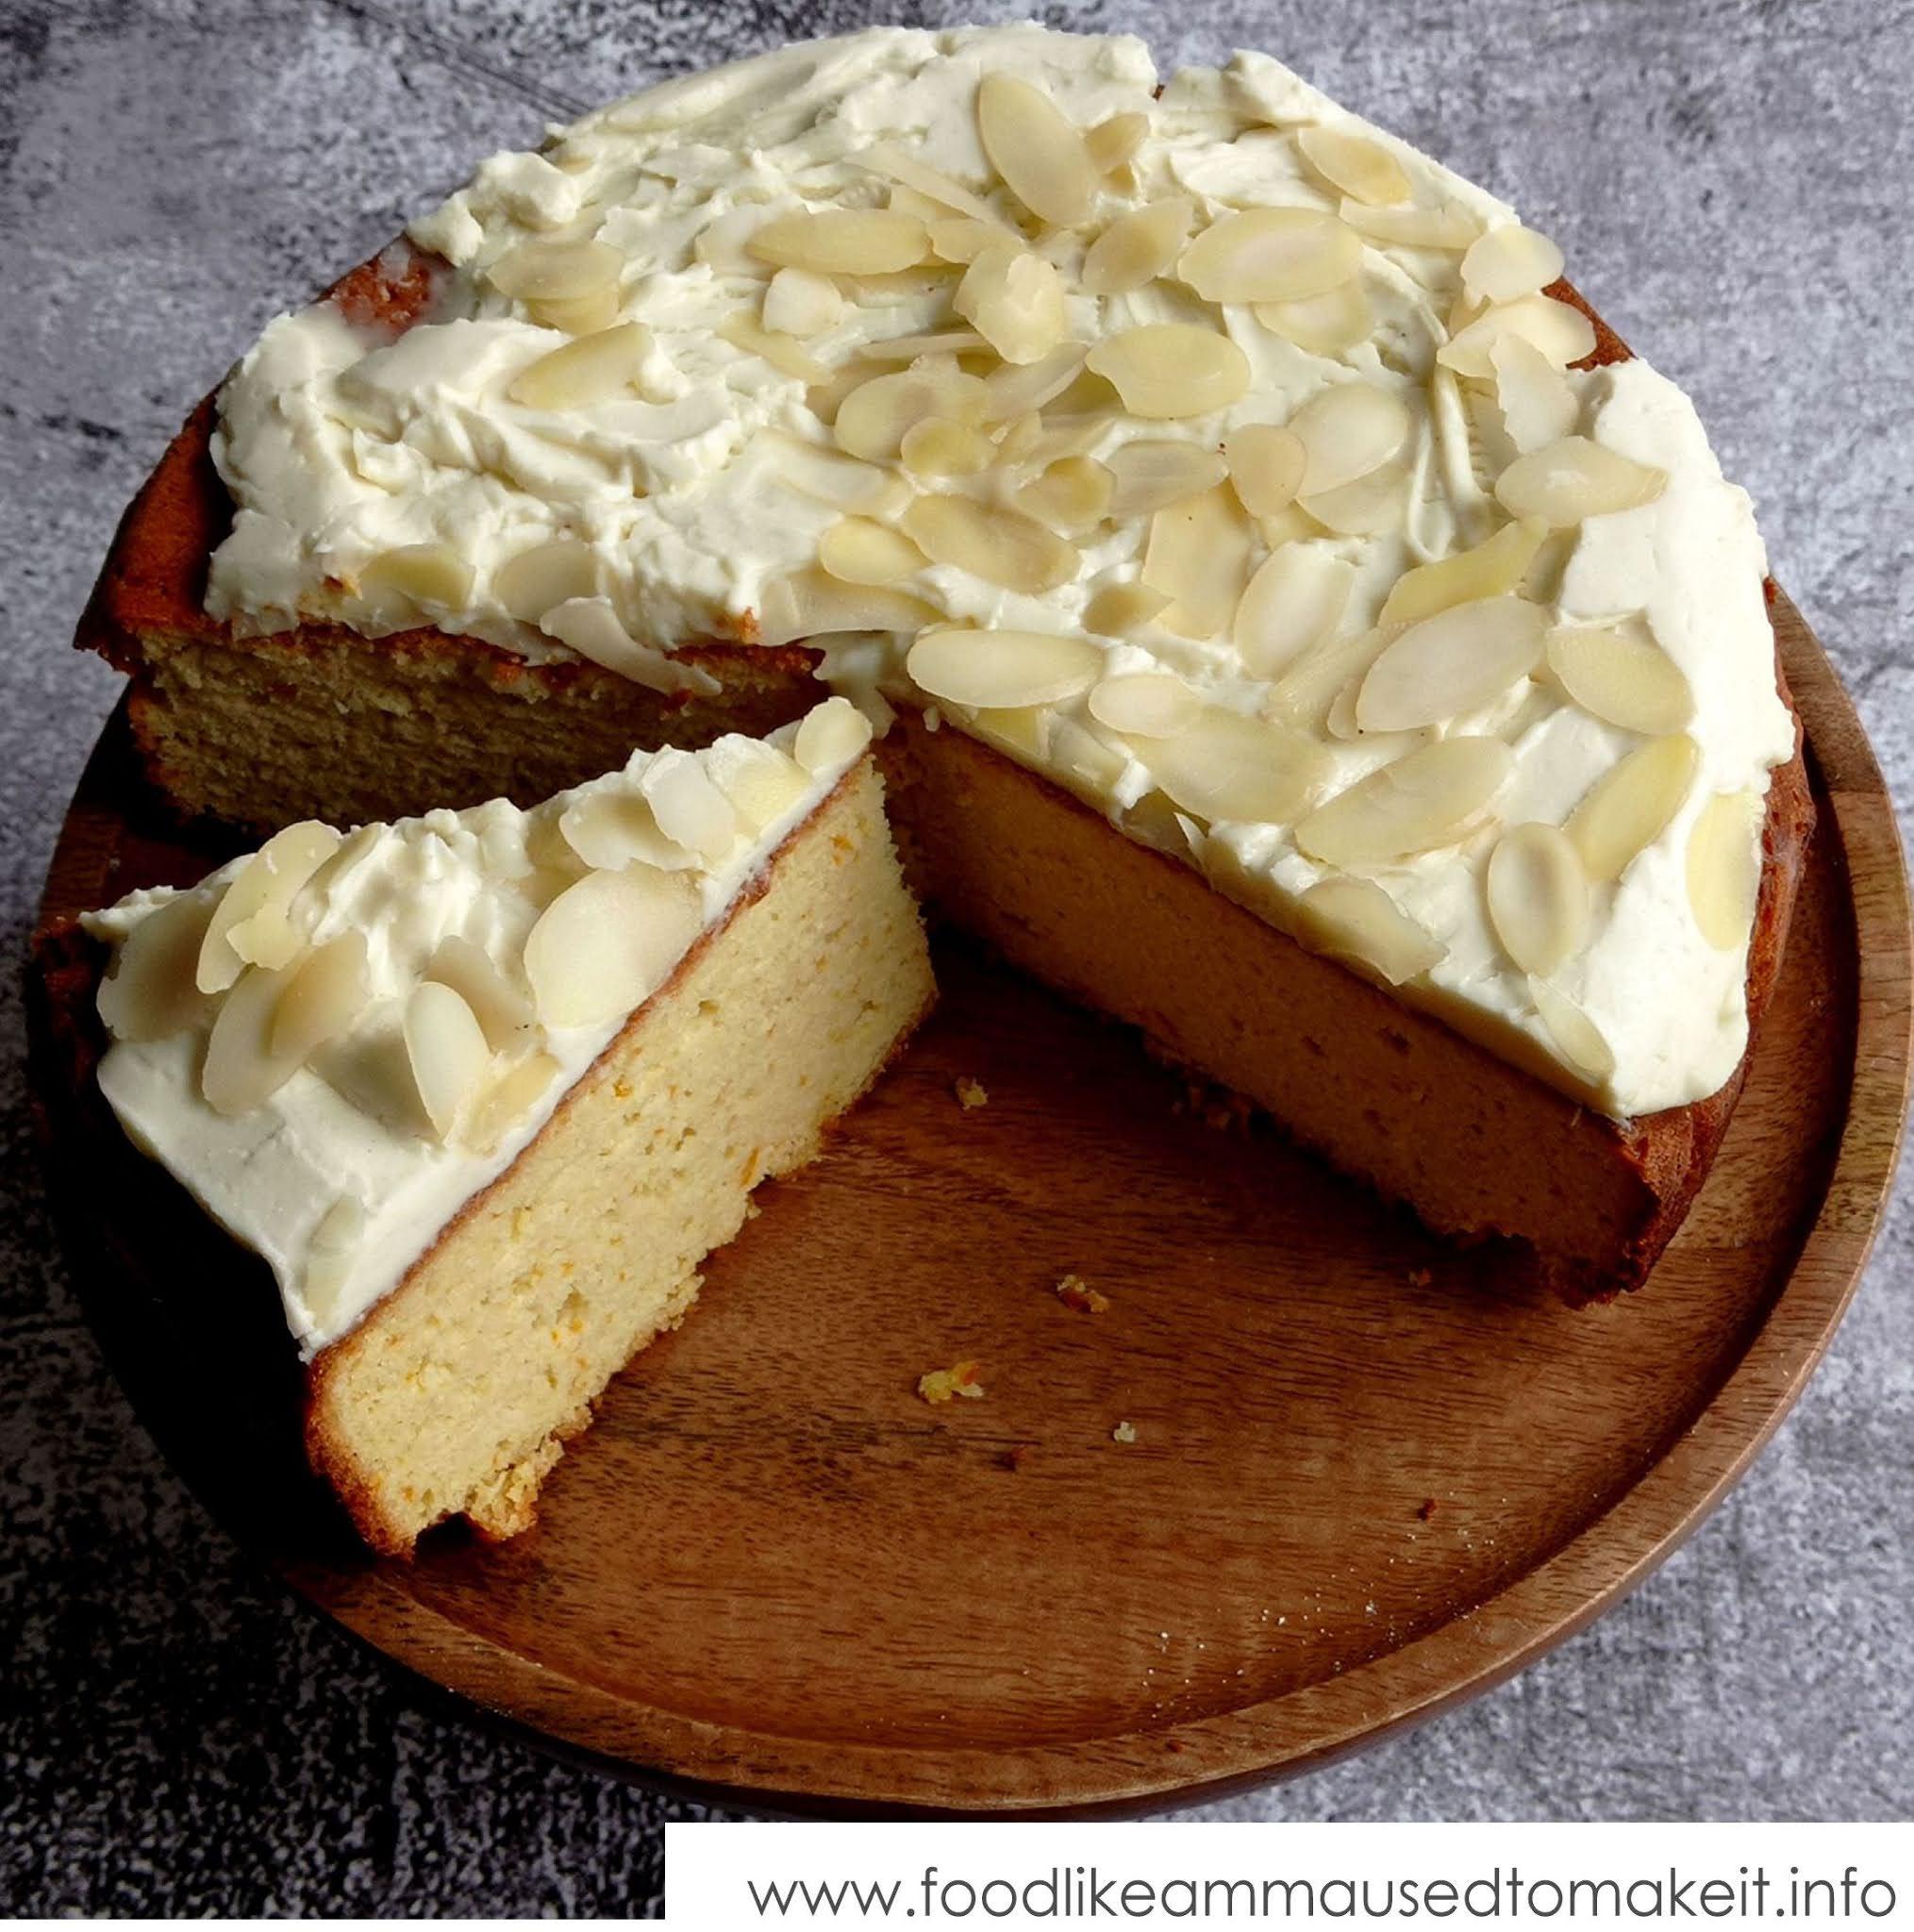 Whole Orange Almond Cake with Cardamom